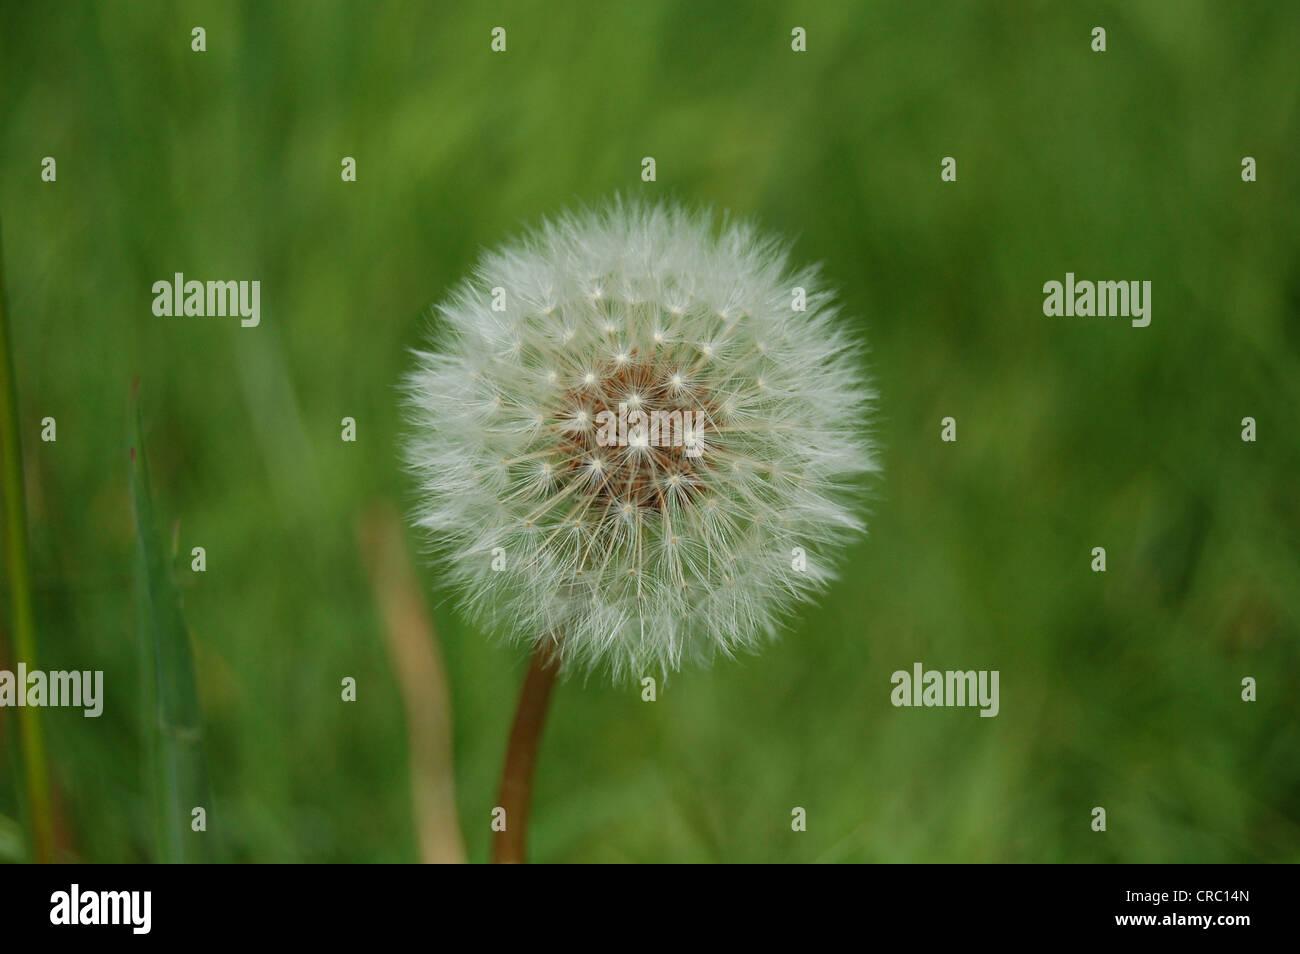 Dandelion, Taraxacum with grass background, Scotland. - Stock Image